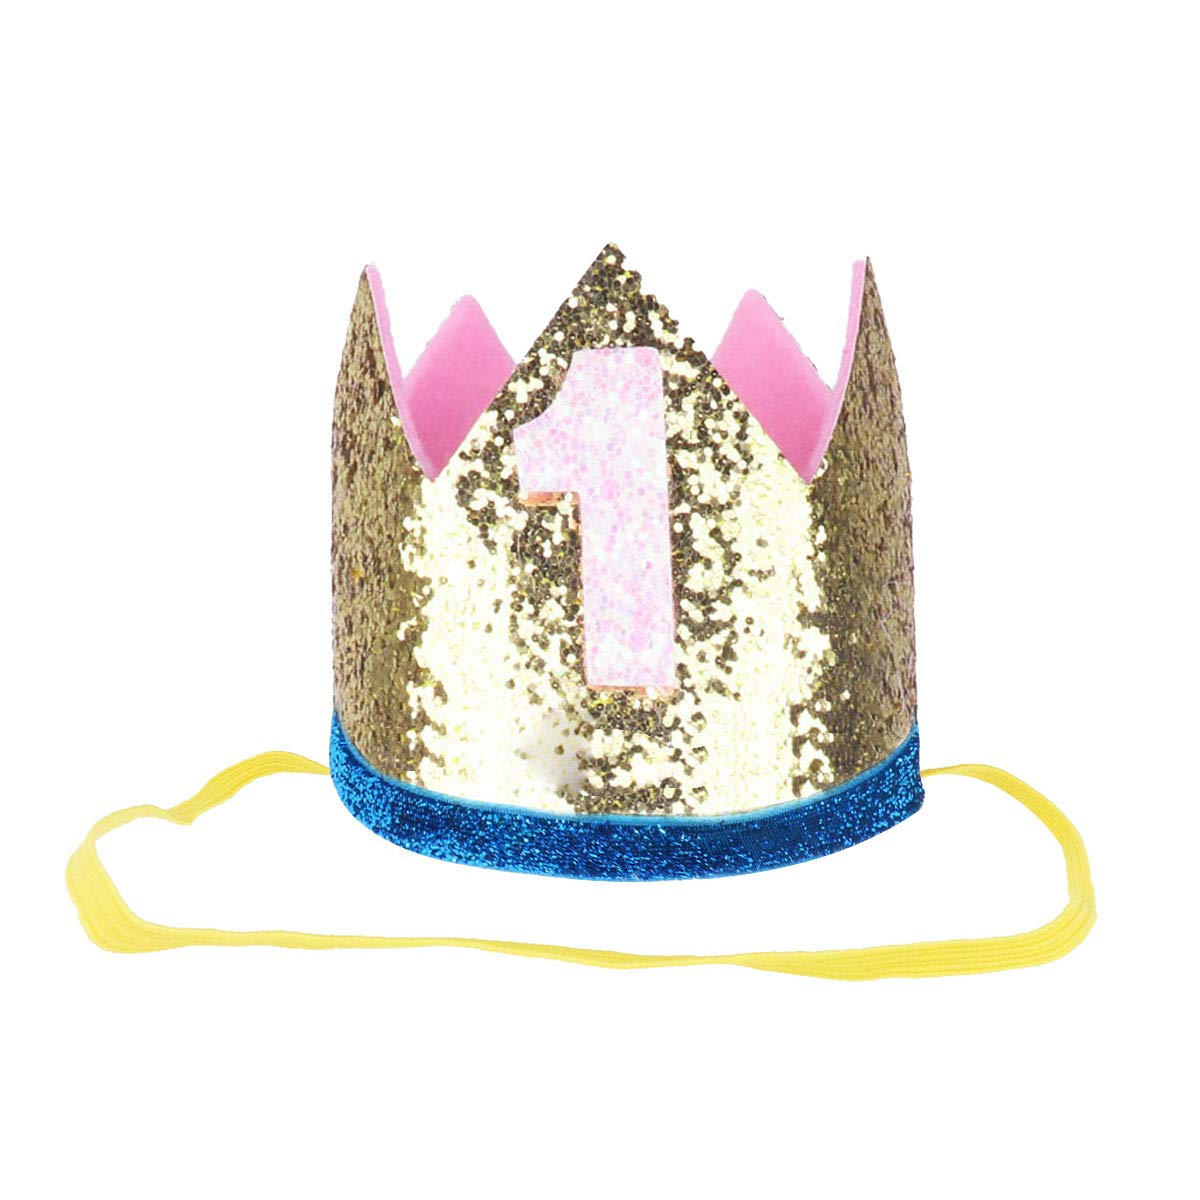 iiniim Baby Girls Boys First /1st Birthday Party Hat Little Prince Crown Headband Head wear Accessories Gold Number 1 One Size